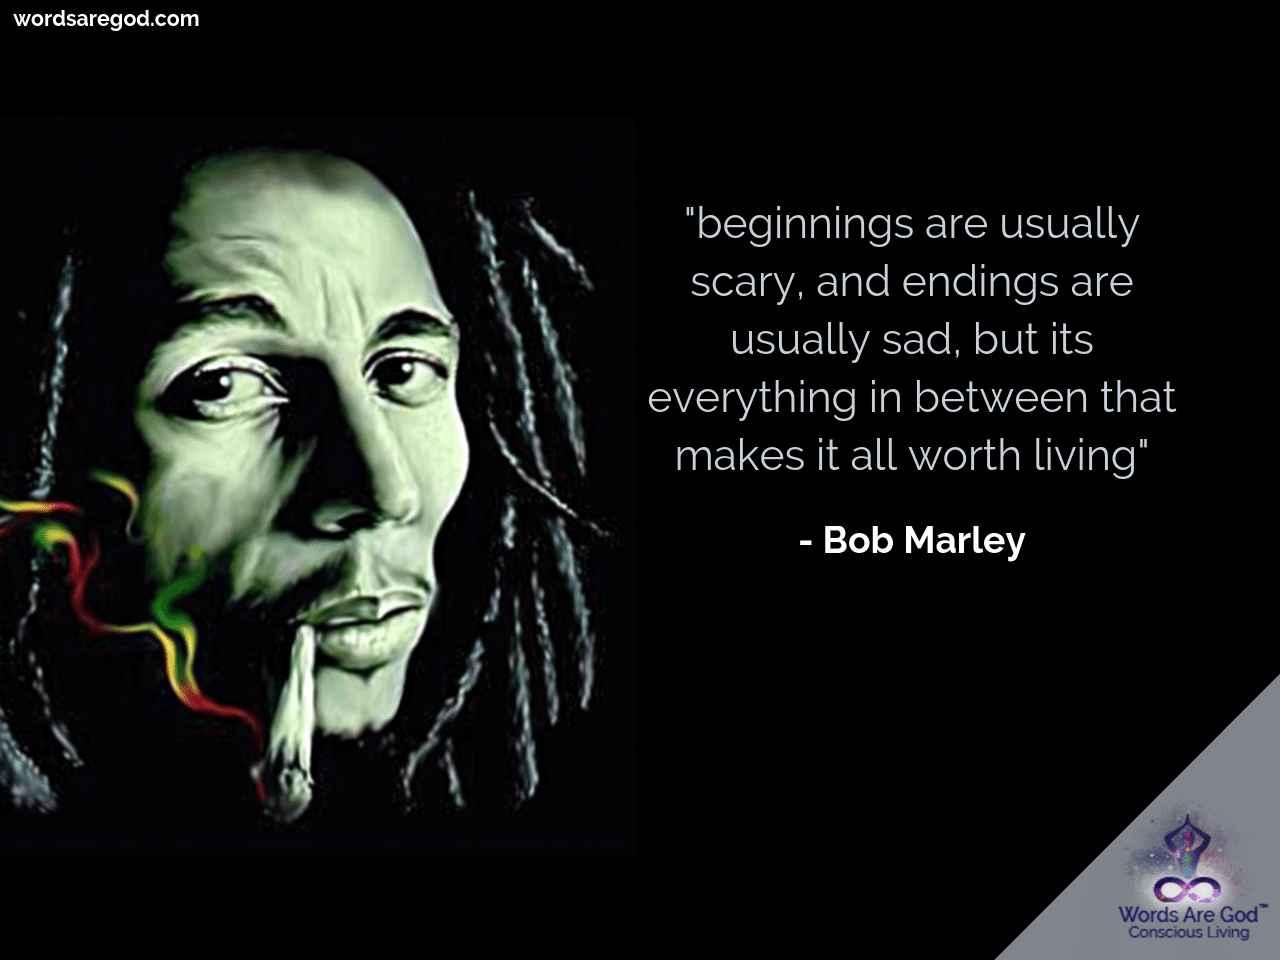 Bob Marley Life Quote